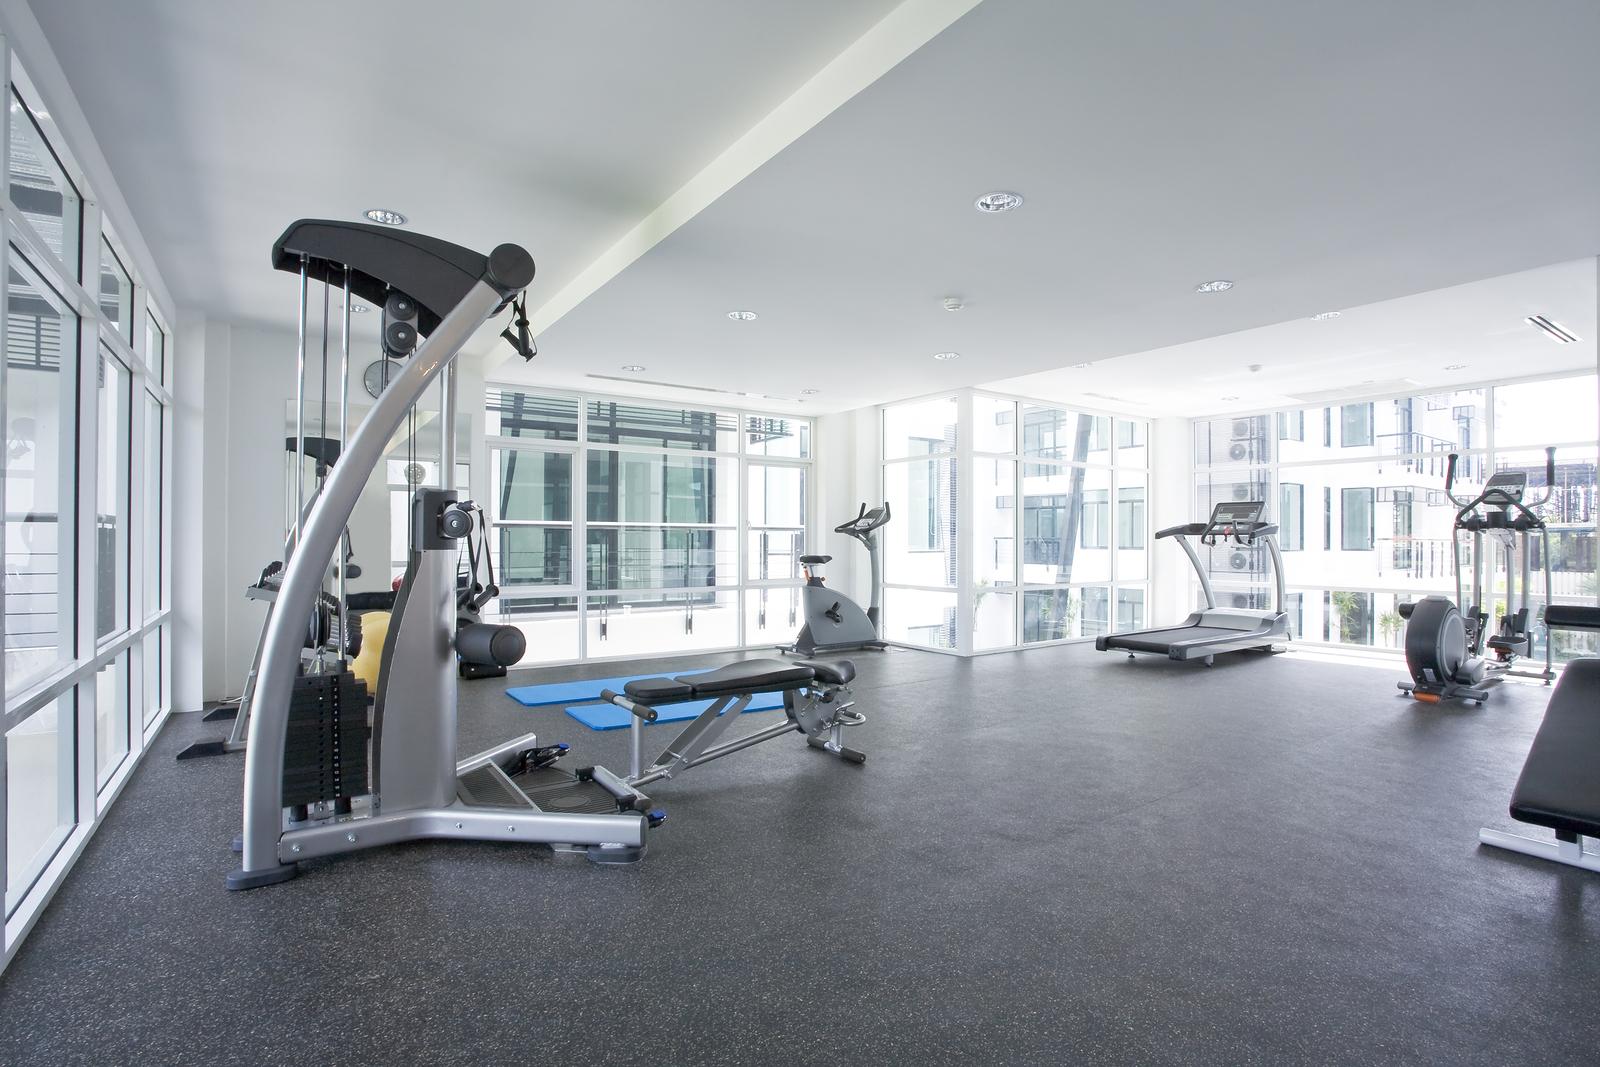 Living Room Gym Equipment